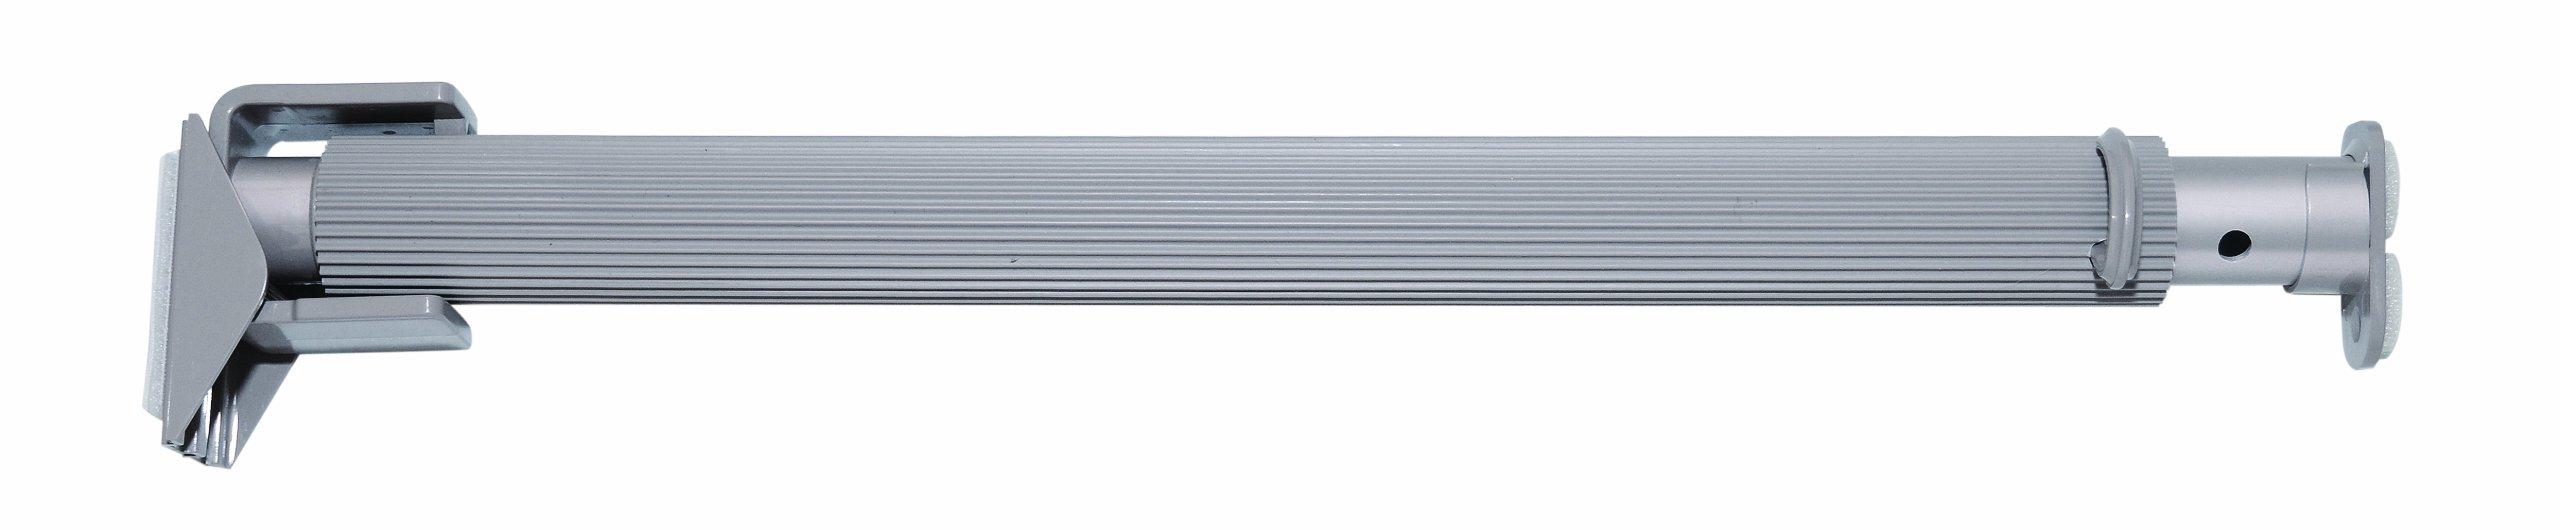 Wedgit Tan Maxi Twist Tight Adjustable Sliding Window & Door Security bar extends from 25'' to 42''